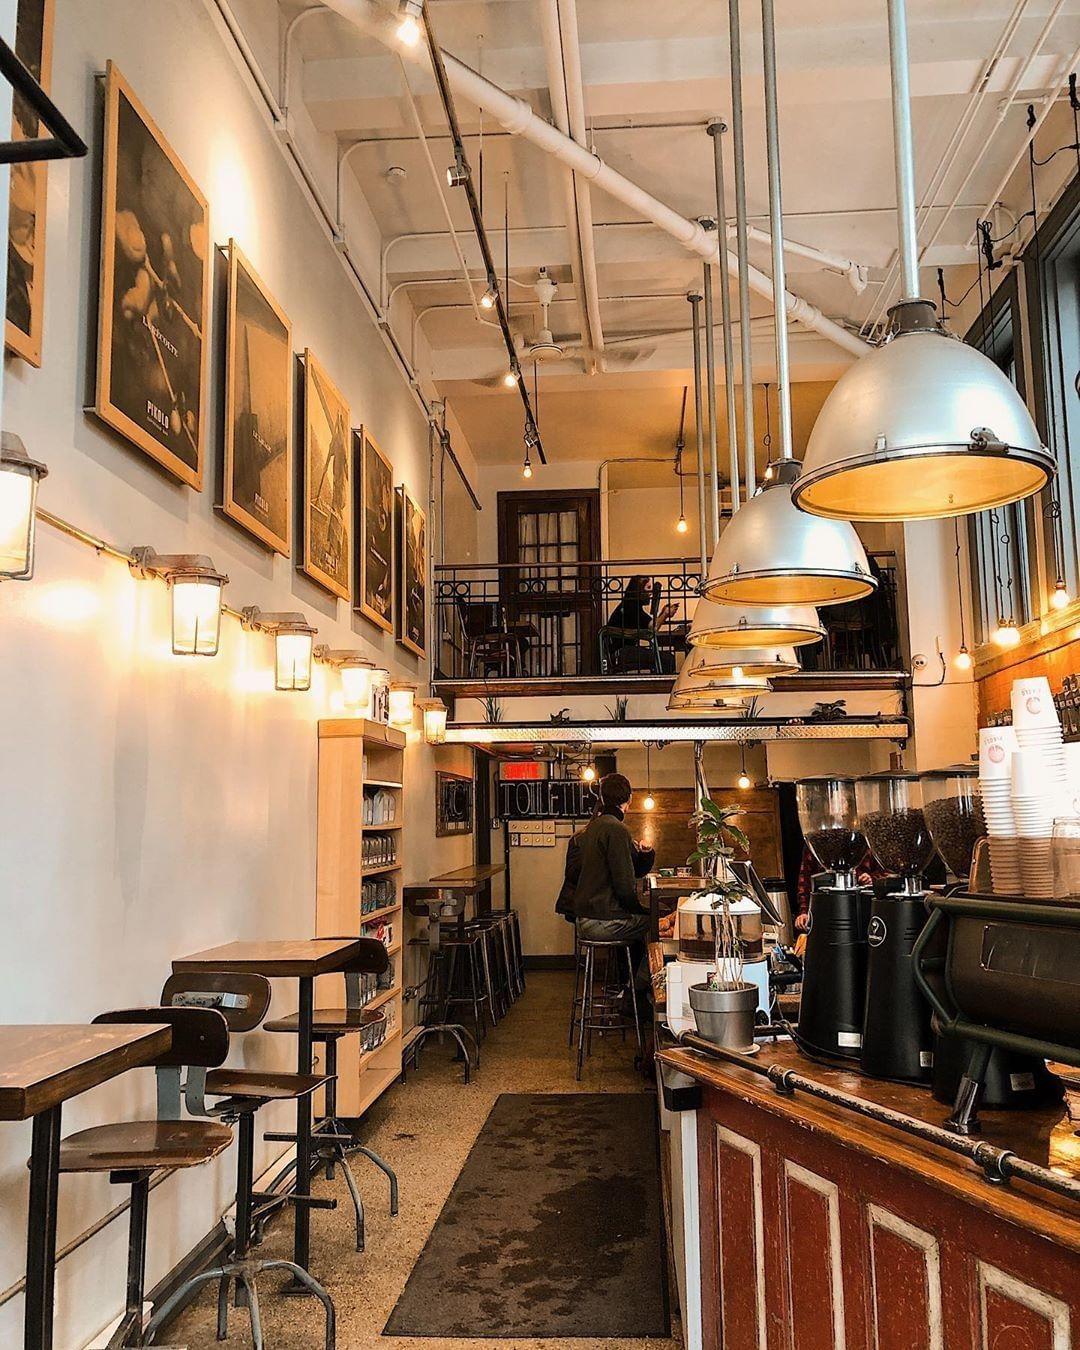 Pikolo Montreal Cozy Cafe Interior Espresso Bar Trendy Interior Design